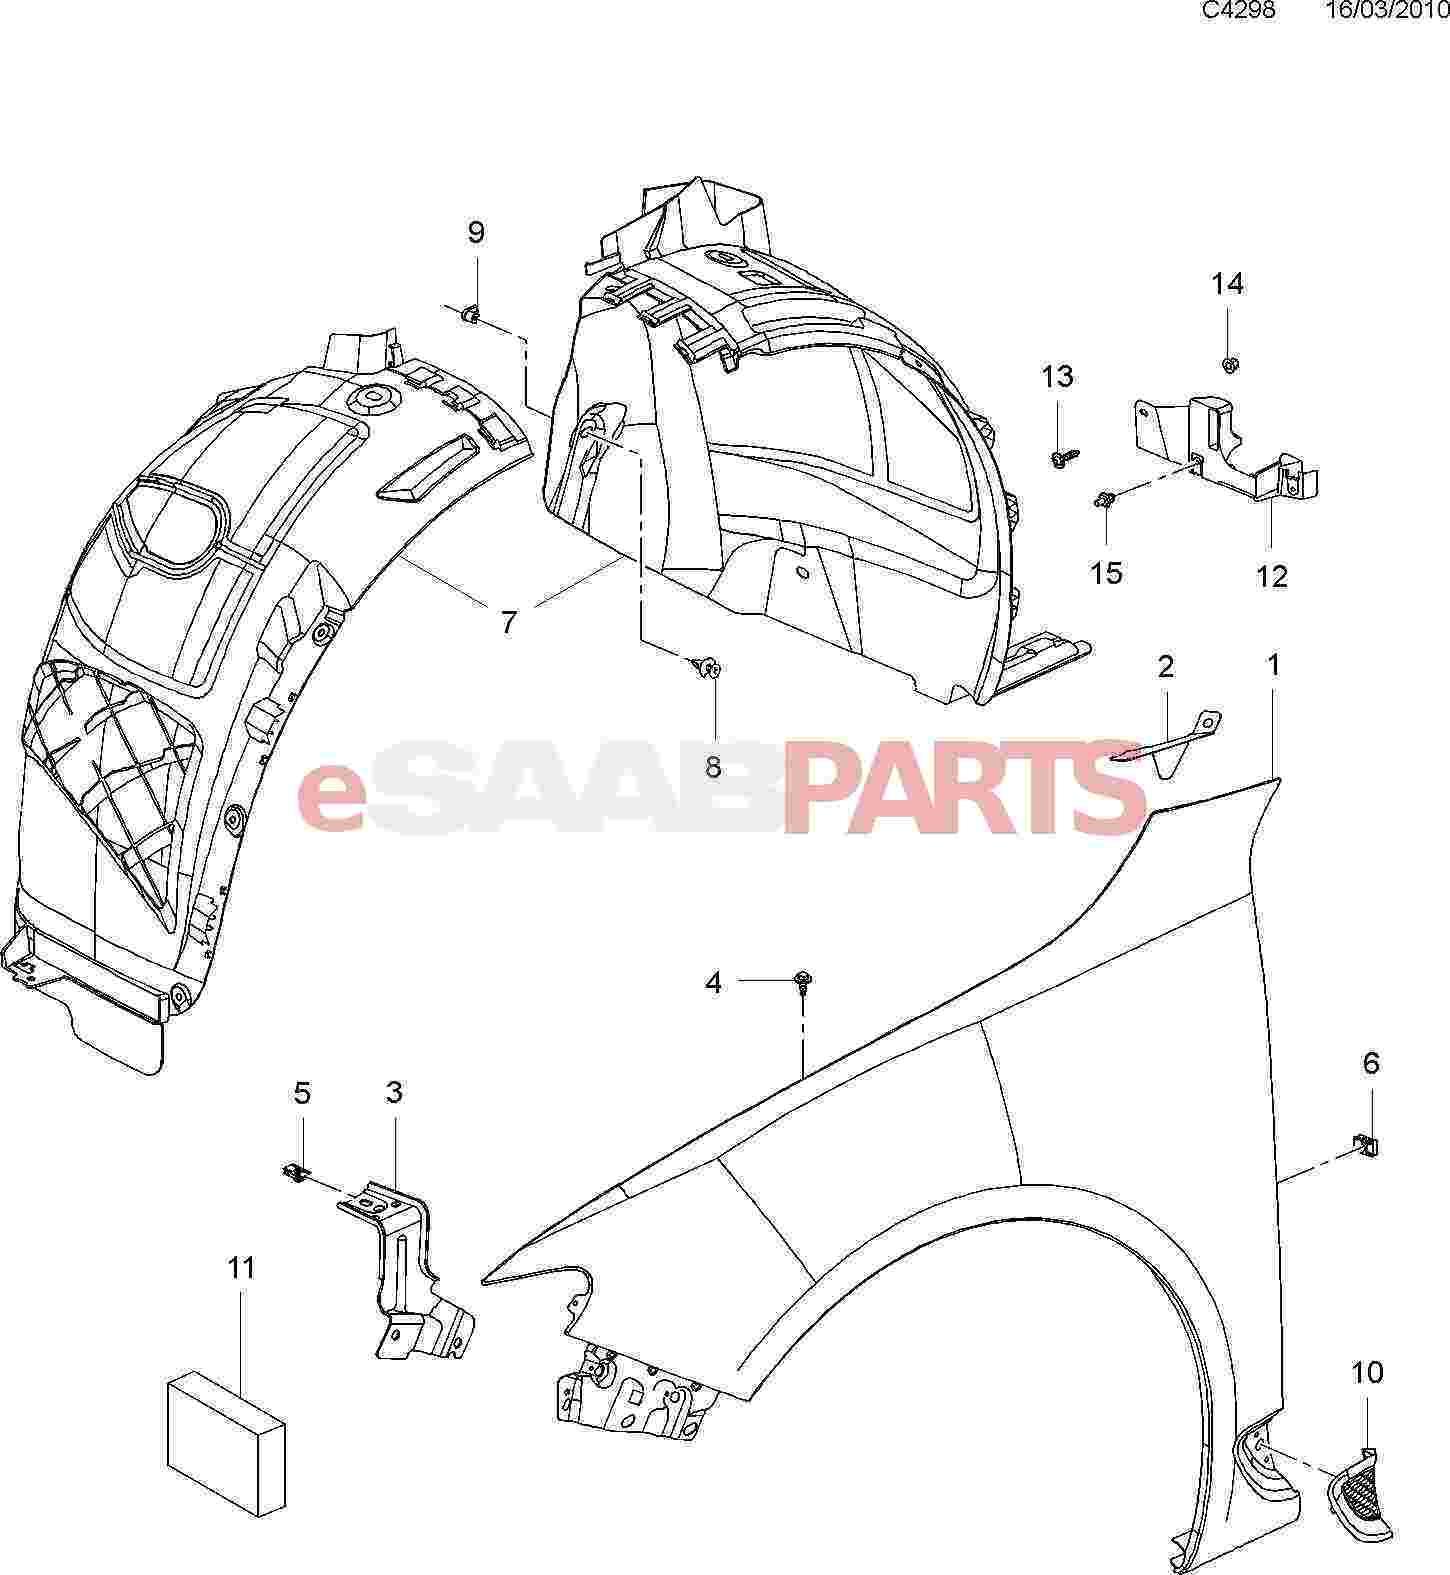 hight resolution of esaabparts com saab 9 5 650 car body external parts fender front fender wheel arch liner